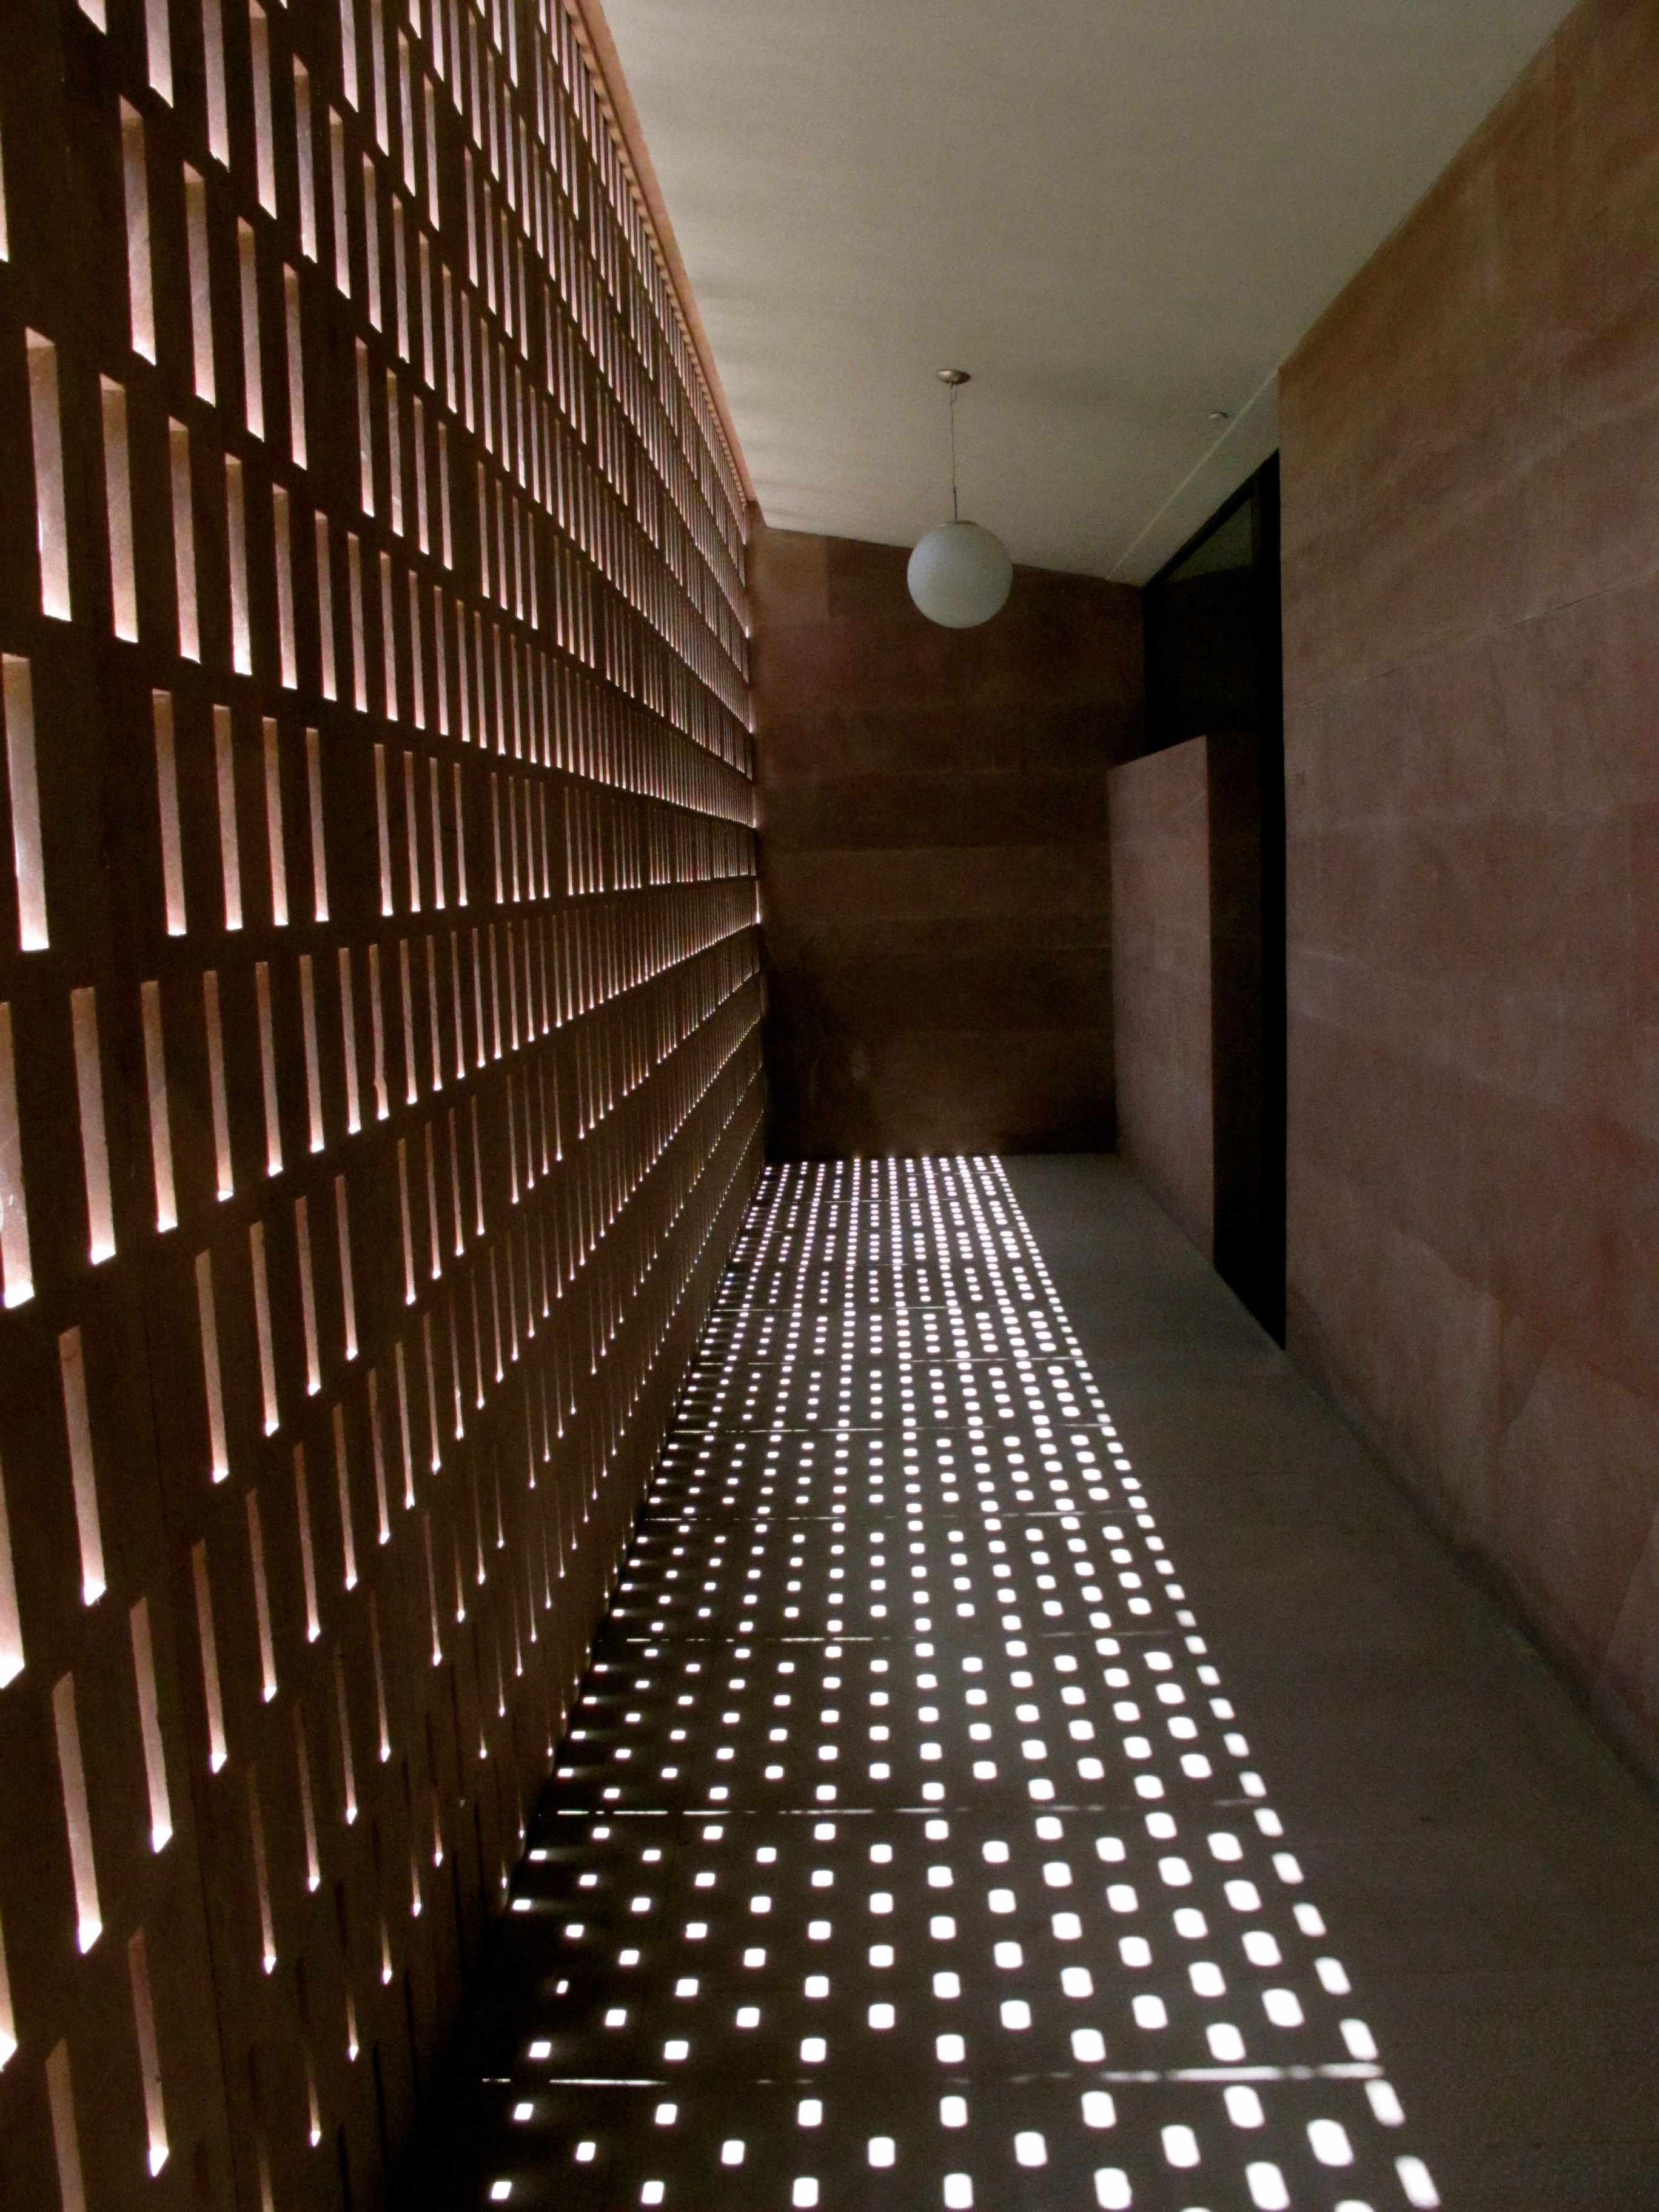 hotel hallway lighting. The Corridor Of Rass Haveli Hotel, Jodhpur, India Hallway With Perforated Carved Stone Screen Wall Dappled Light Effect Hotel Lighting T